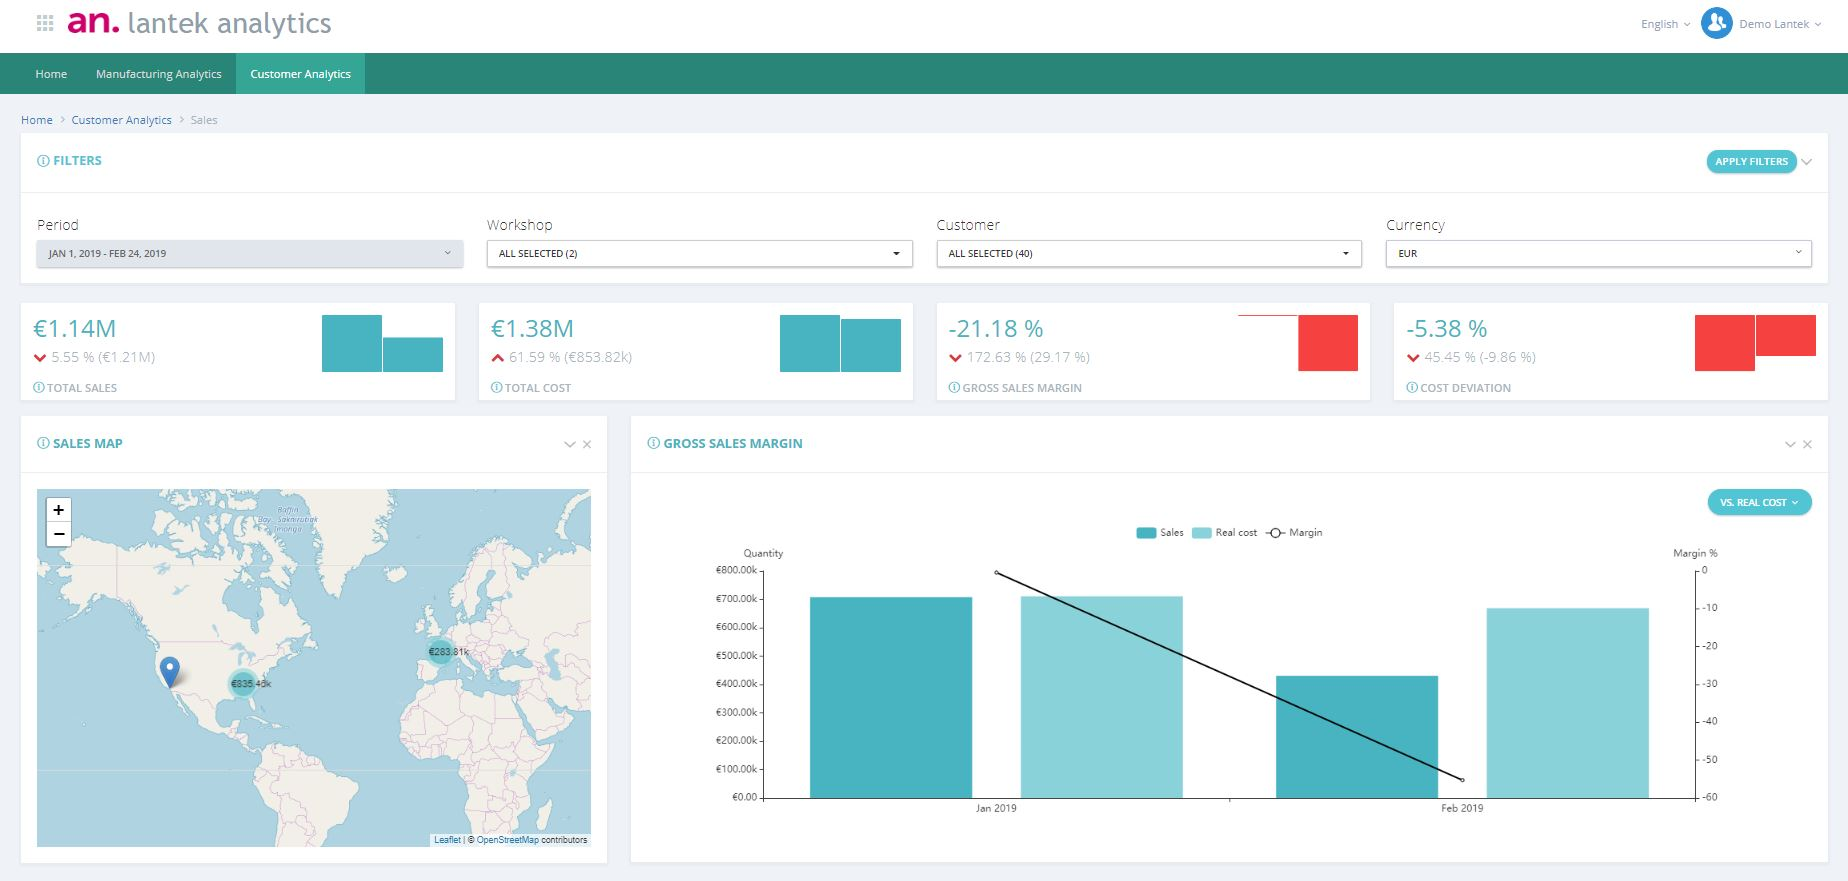 Customer Analytics - Sales